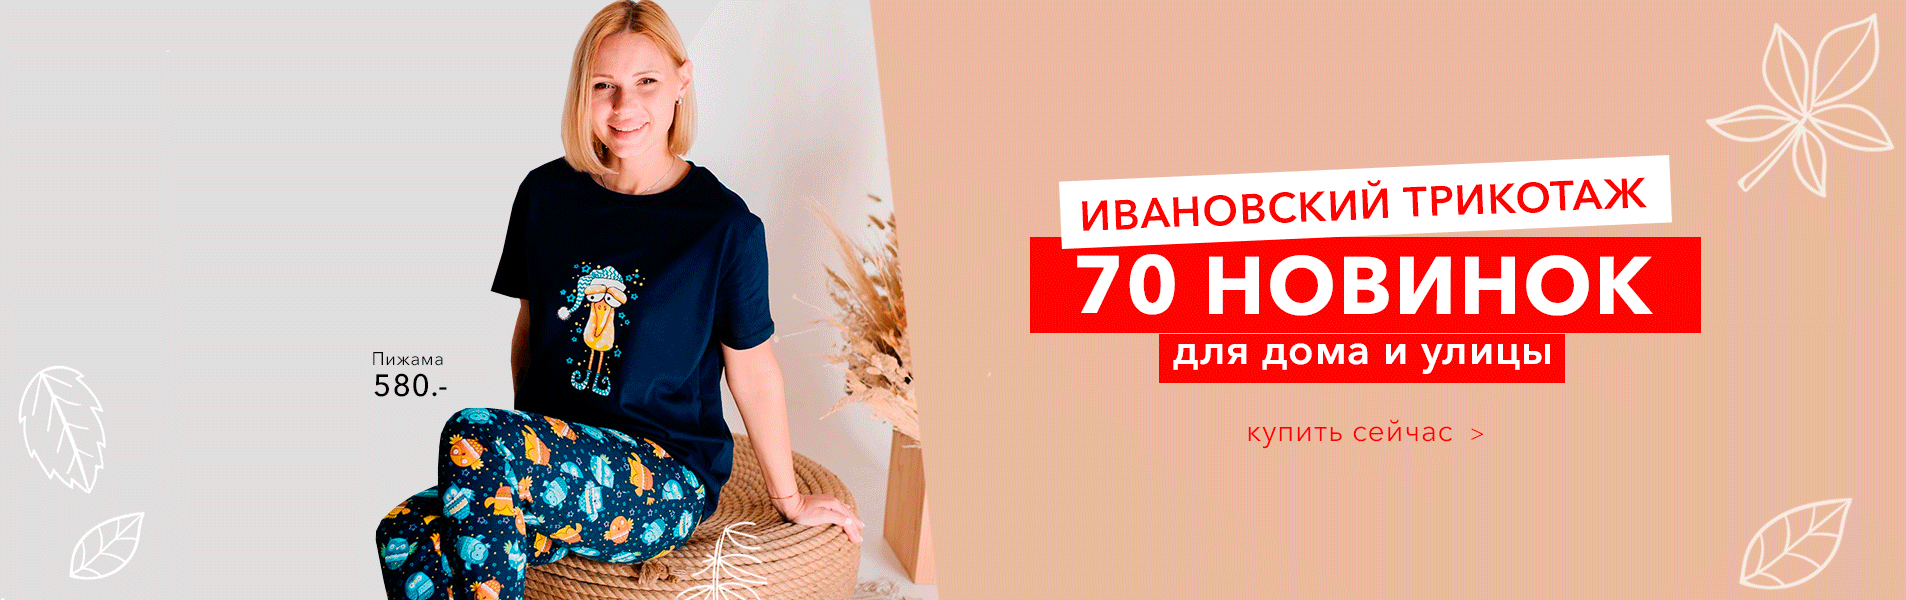 20201019IVANOVO_SLIDER_7.png